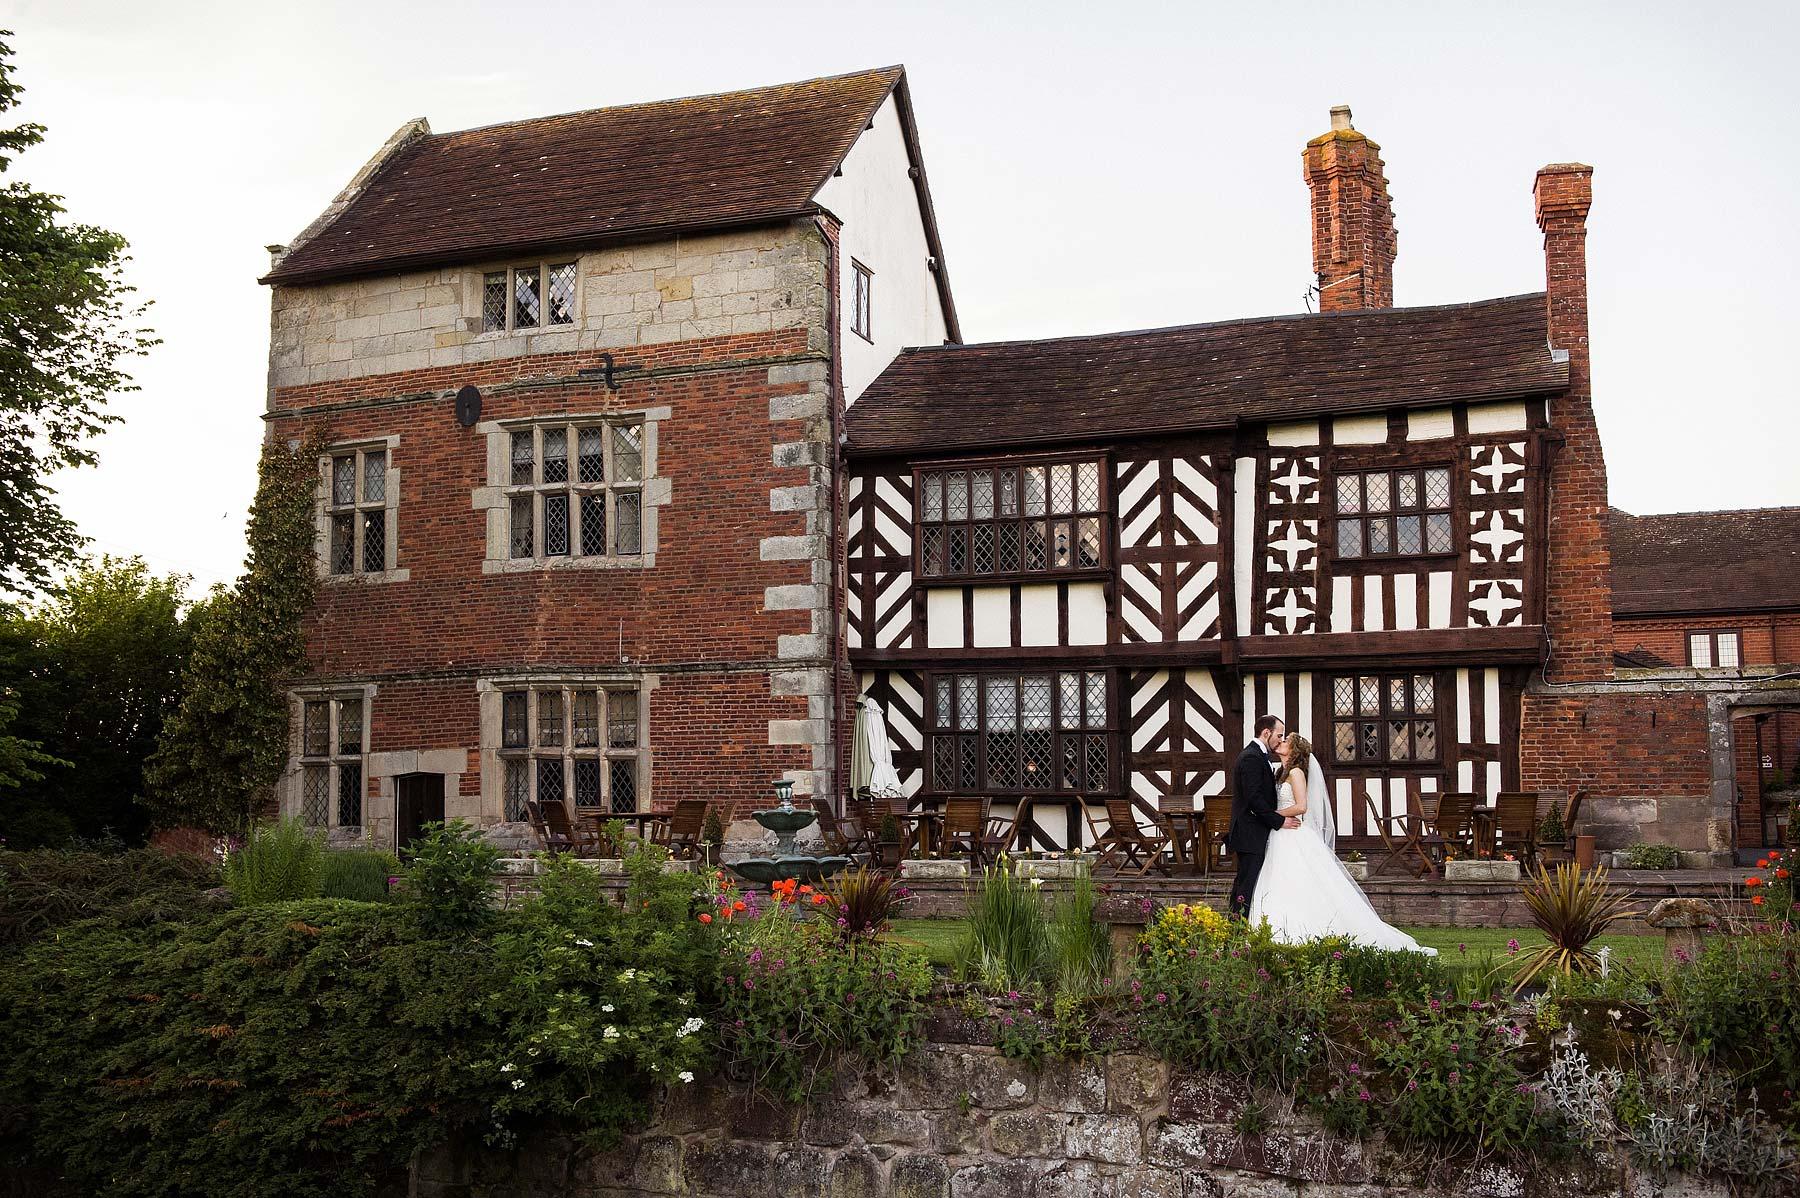 albright-hussey-manor-wedding-photographers-065